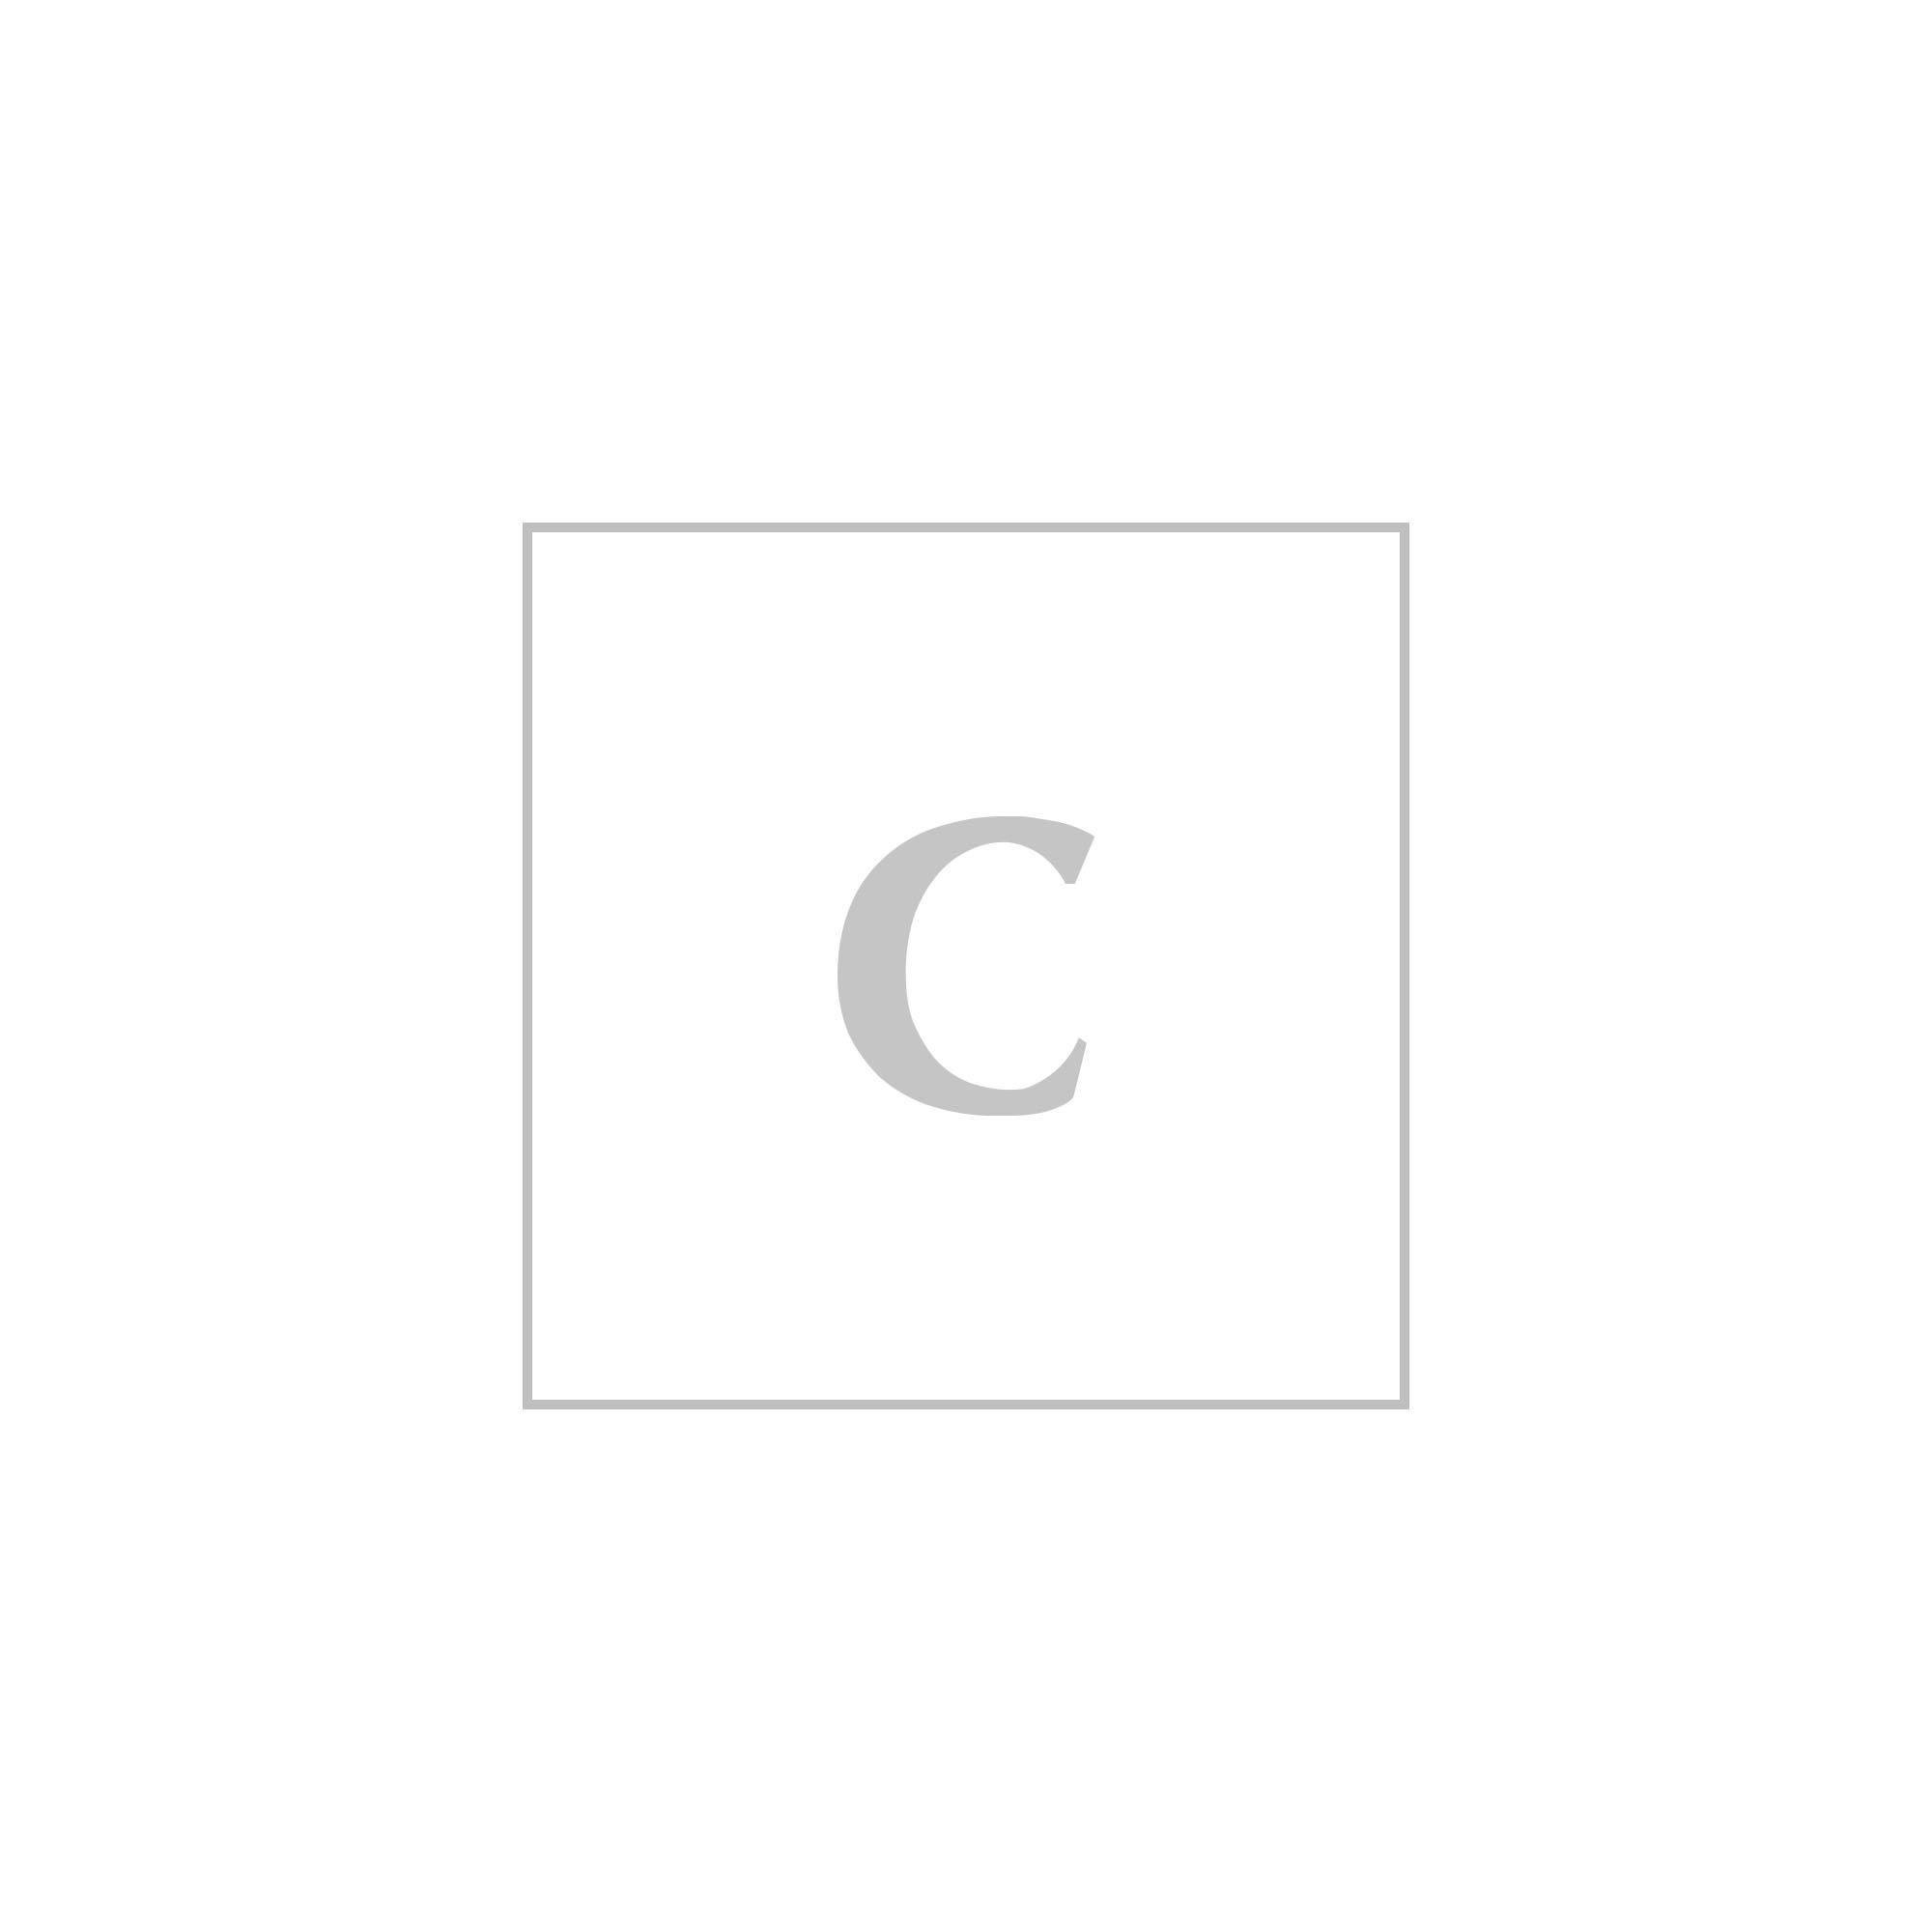 https://www.coltortiboutique.com/media/catalog/product/cache/926507dc7f93631a094422215b778fe0/s/k/skirts_miu-miu_blu_192151dgn000002-f0013-6.jpg